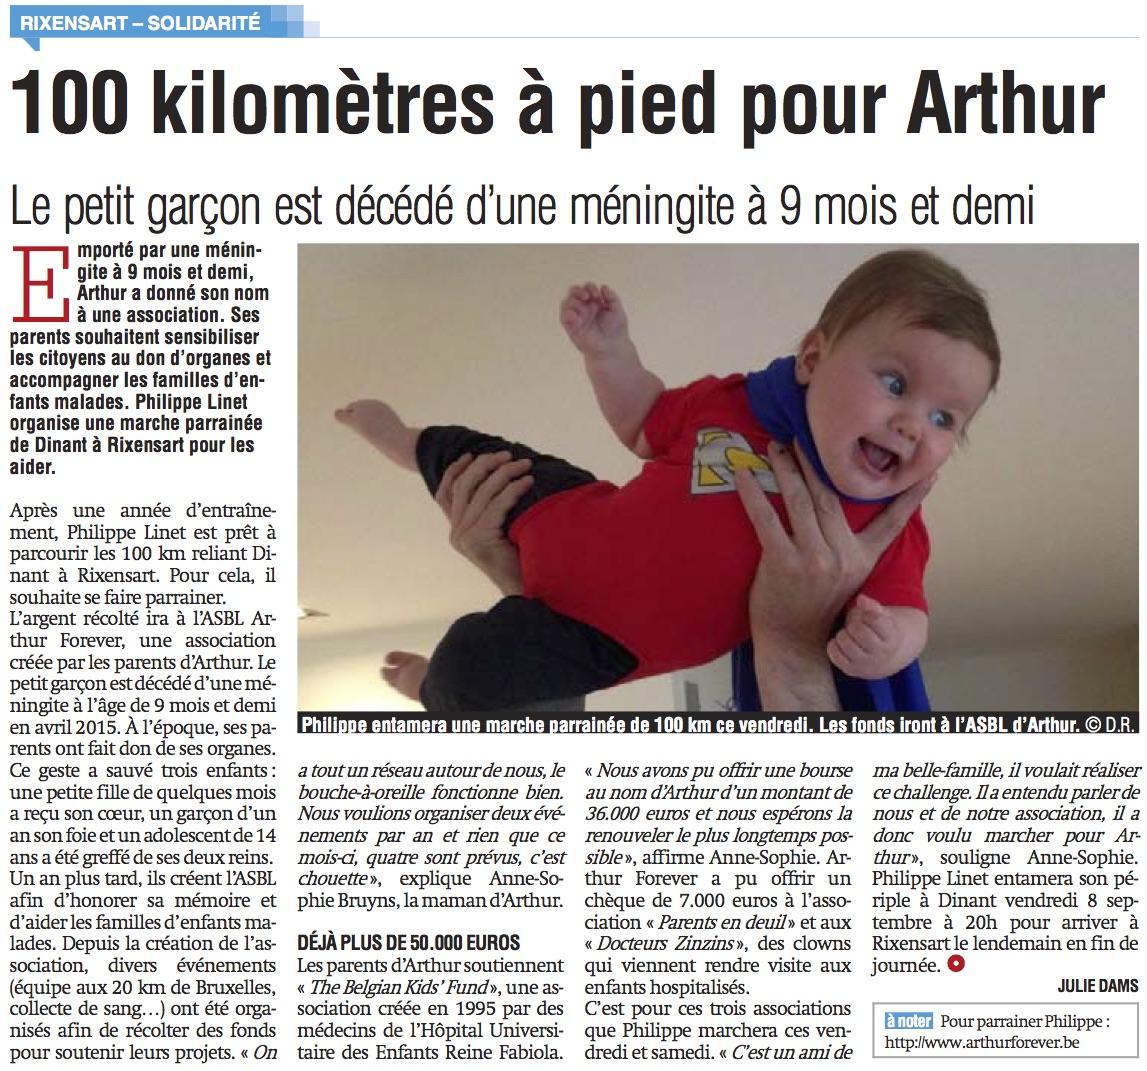 100kmjournal - copie 2.jpg